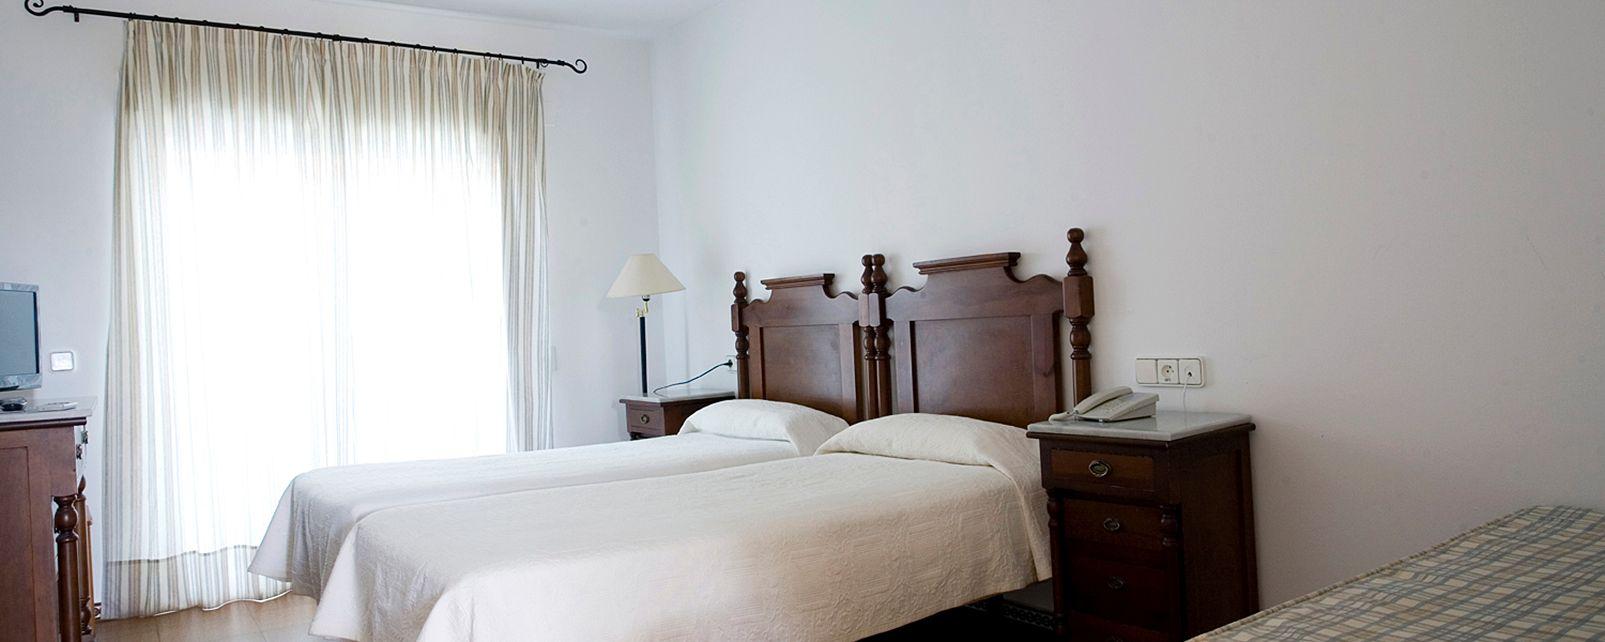 Hotel campomar el puerto de santa mar a espa a - Hotel campomar el puerto de sta maria ...